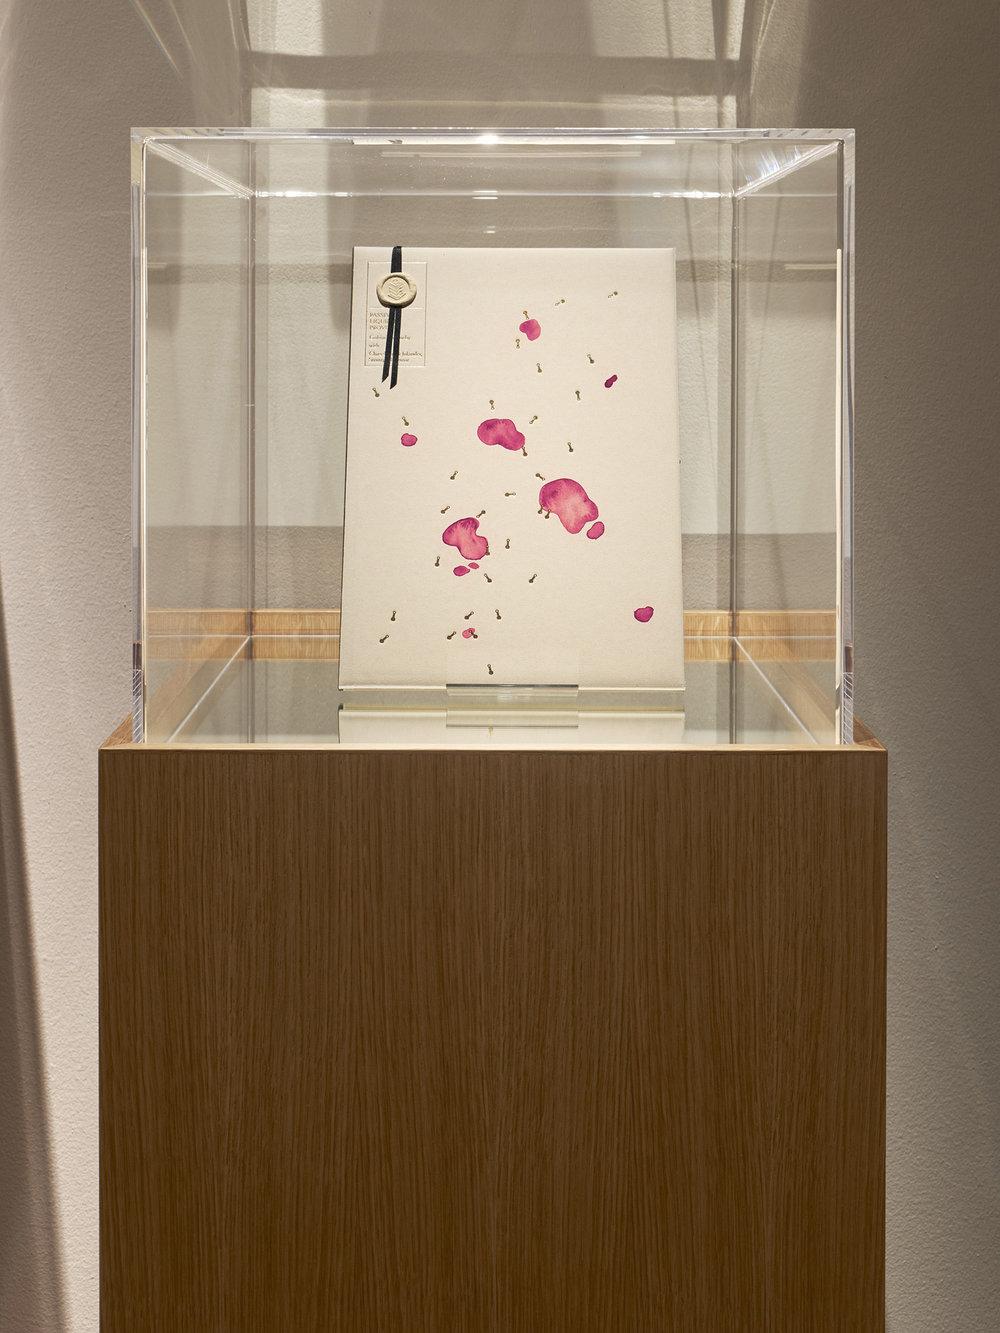 Goldin + Senneby   Passive Liquidity Provider,  2013 Watercolor, foil, sealing wax, wood (oak veneer), mirror, acrylic glas 44 x 60 x 135 cm Edition 1 + 1 AP